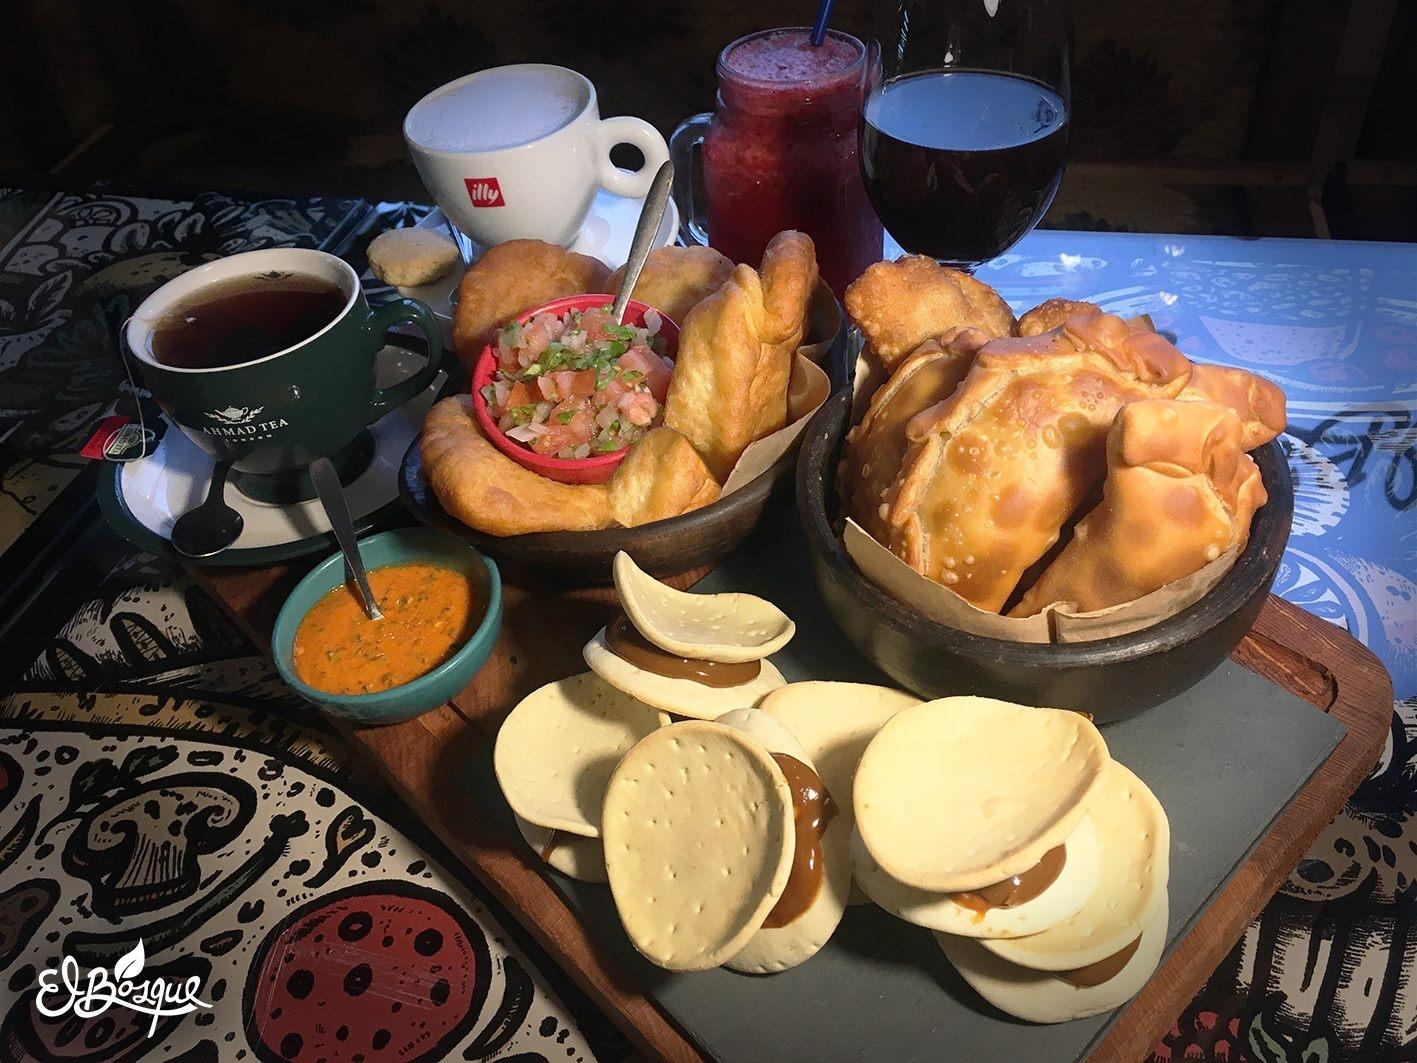 El Bosque Cocina & Bar - Rancagua 293 293, Puerto Montt | Reservas ...